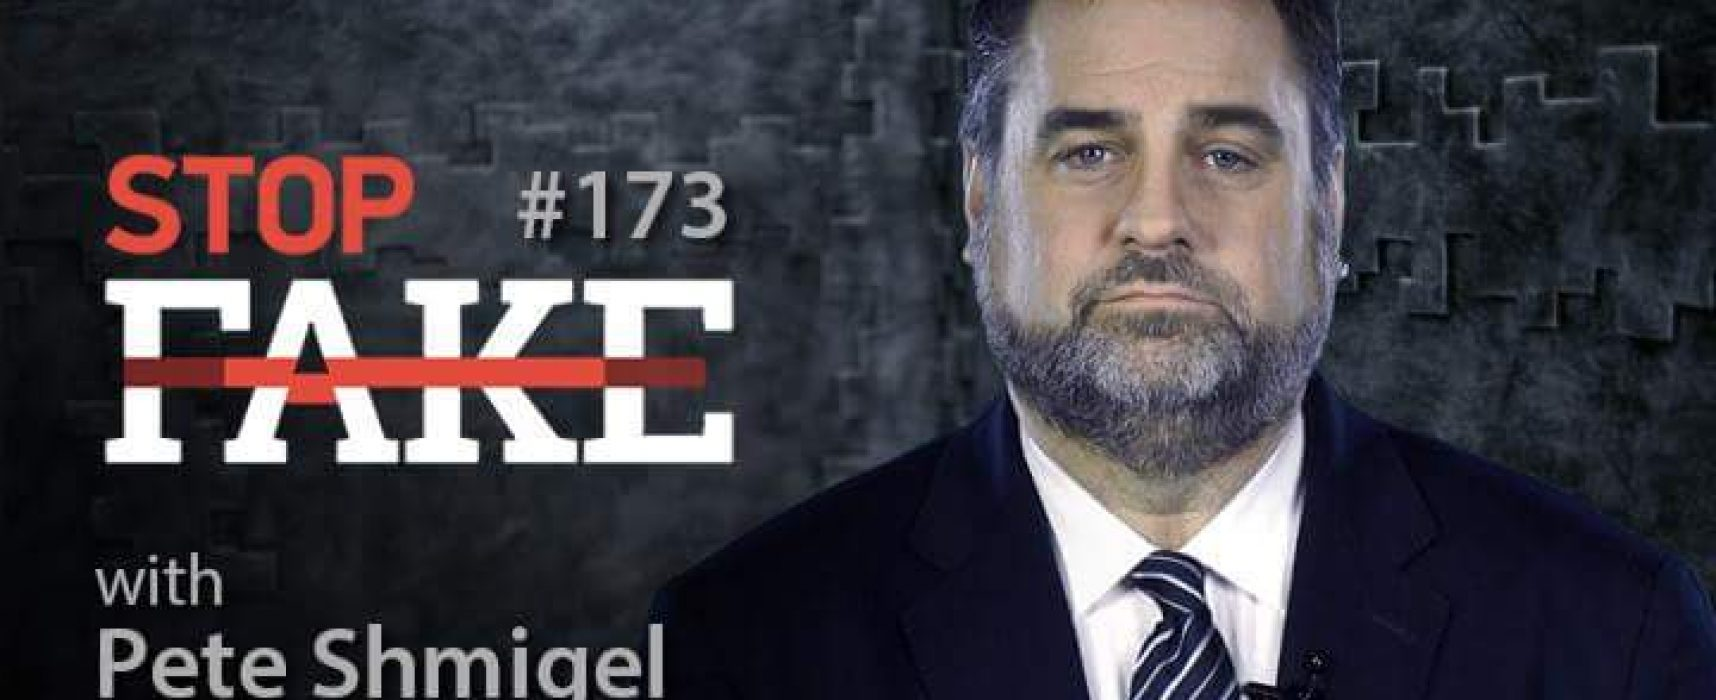 StopFakeNews #173 Peter Shmigel